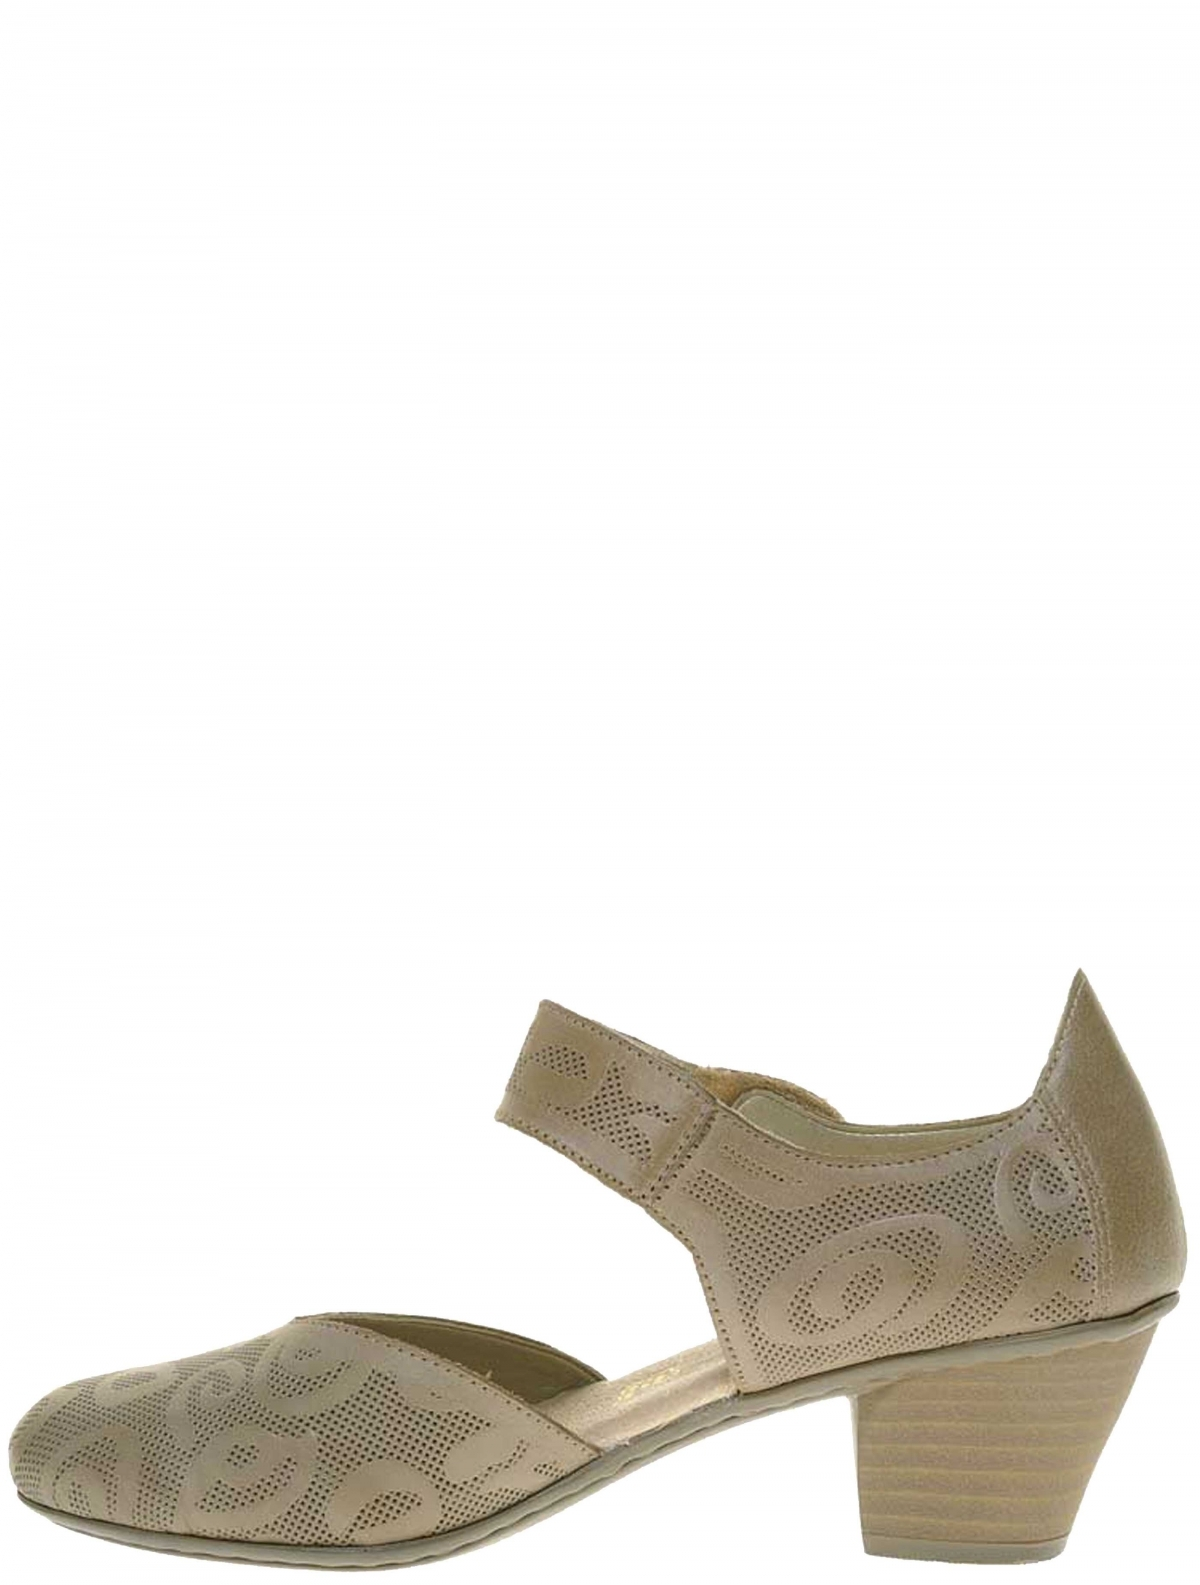 45053-62 туфли женские